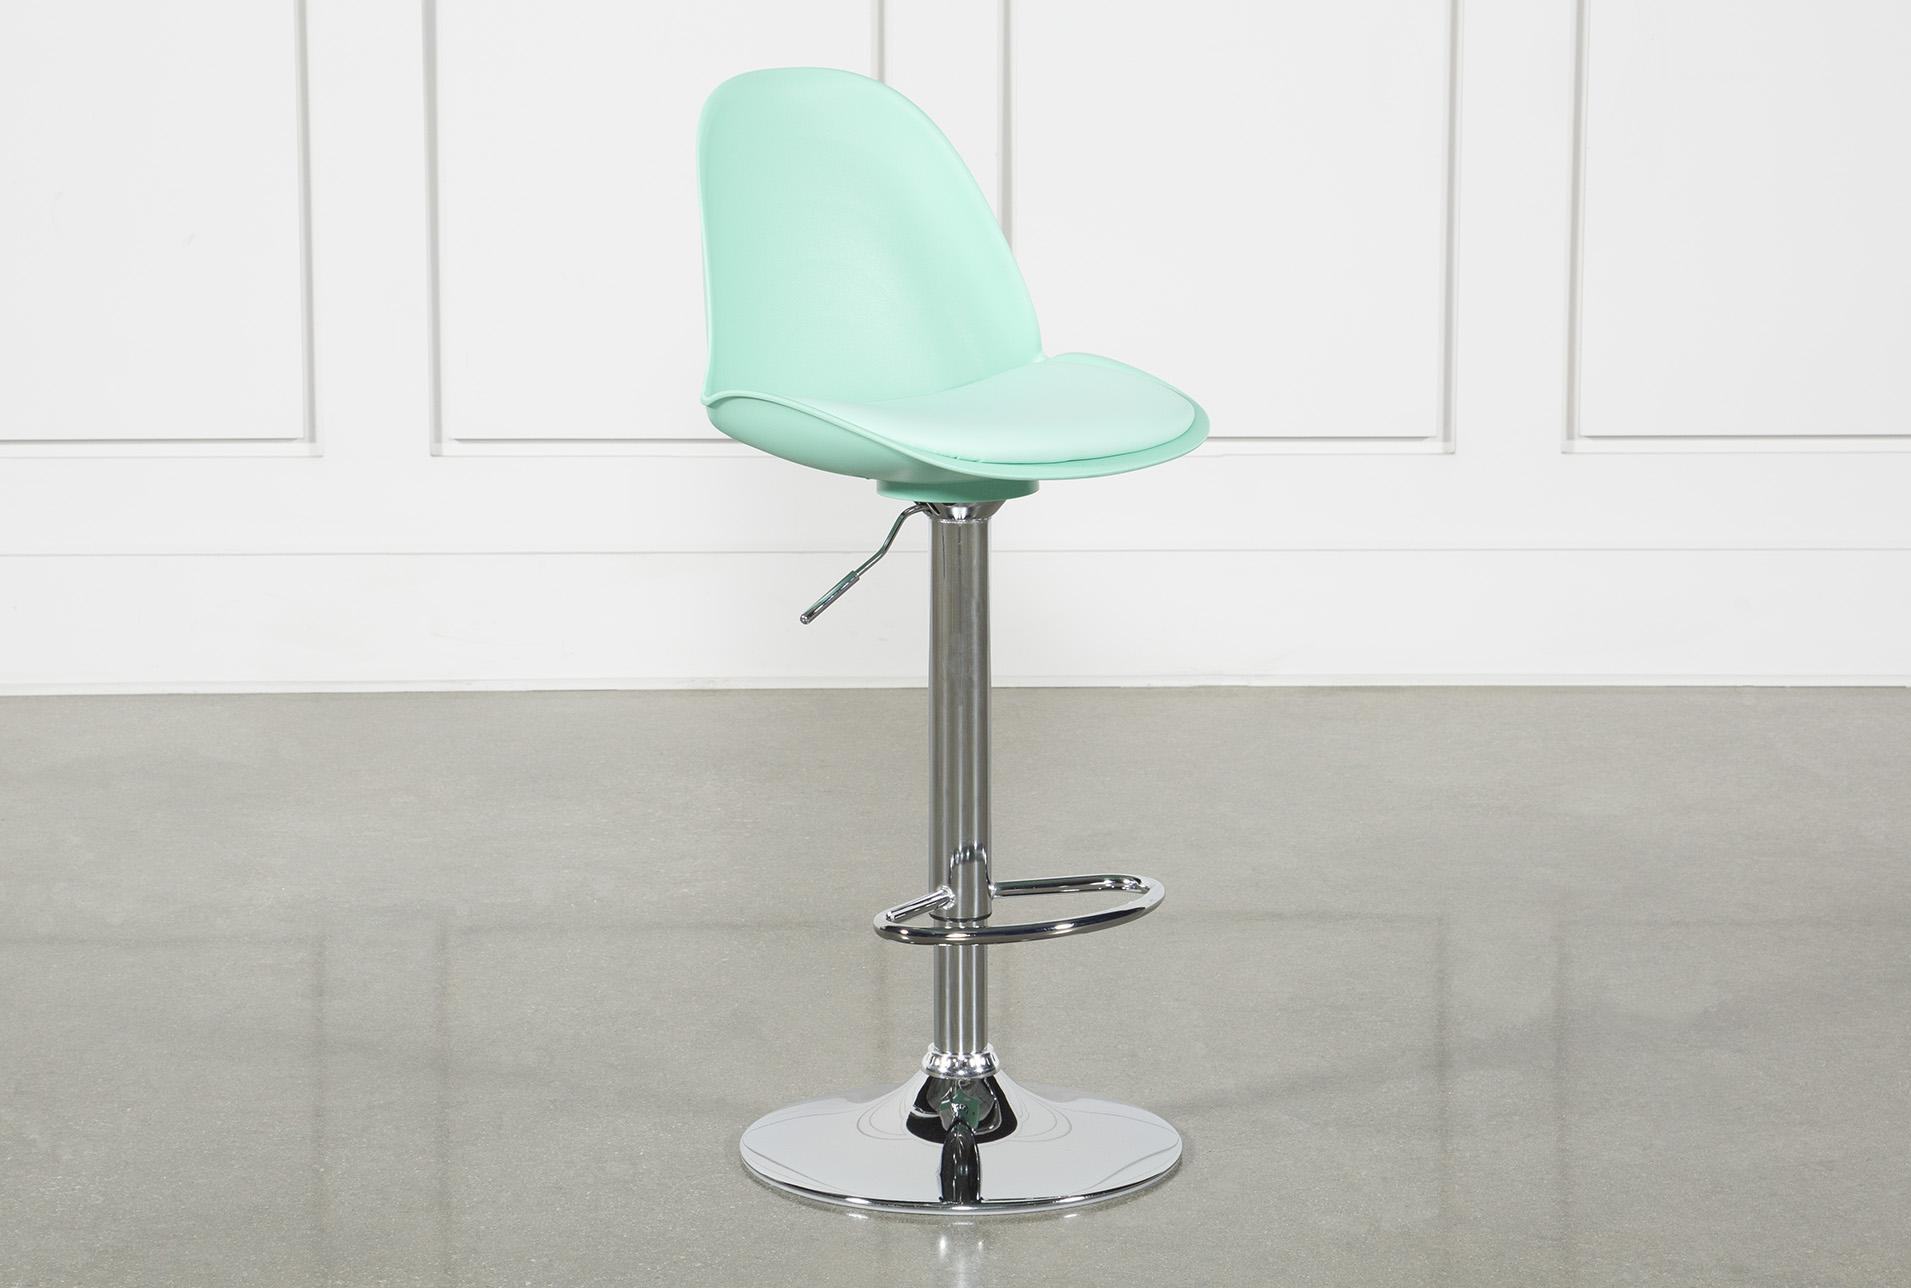 Outstanding Dixon Aqua 33 Inch Adjustable Bar Stool In 2019 Products Ibusinesslaw Wood Chair Design Ideas Ibusinesslaworg